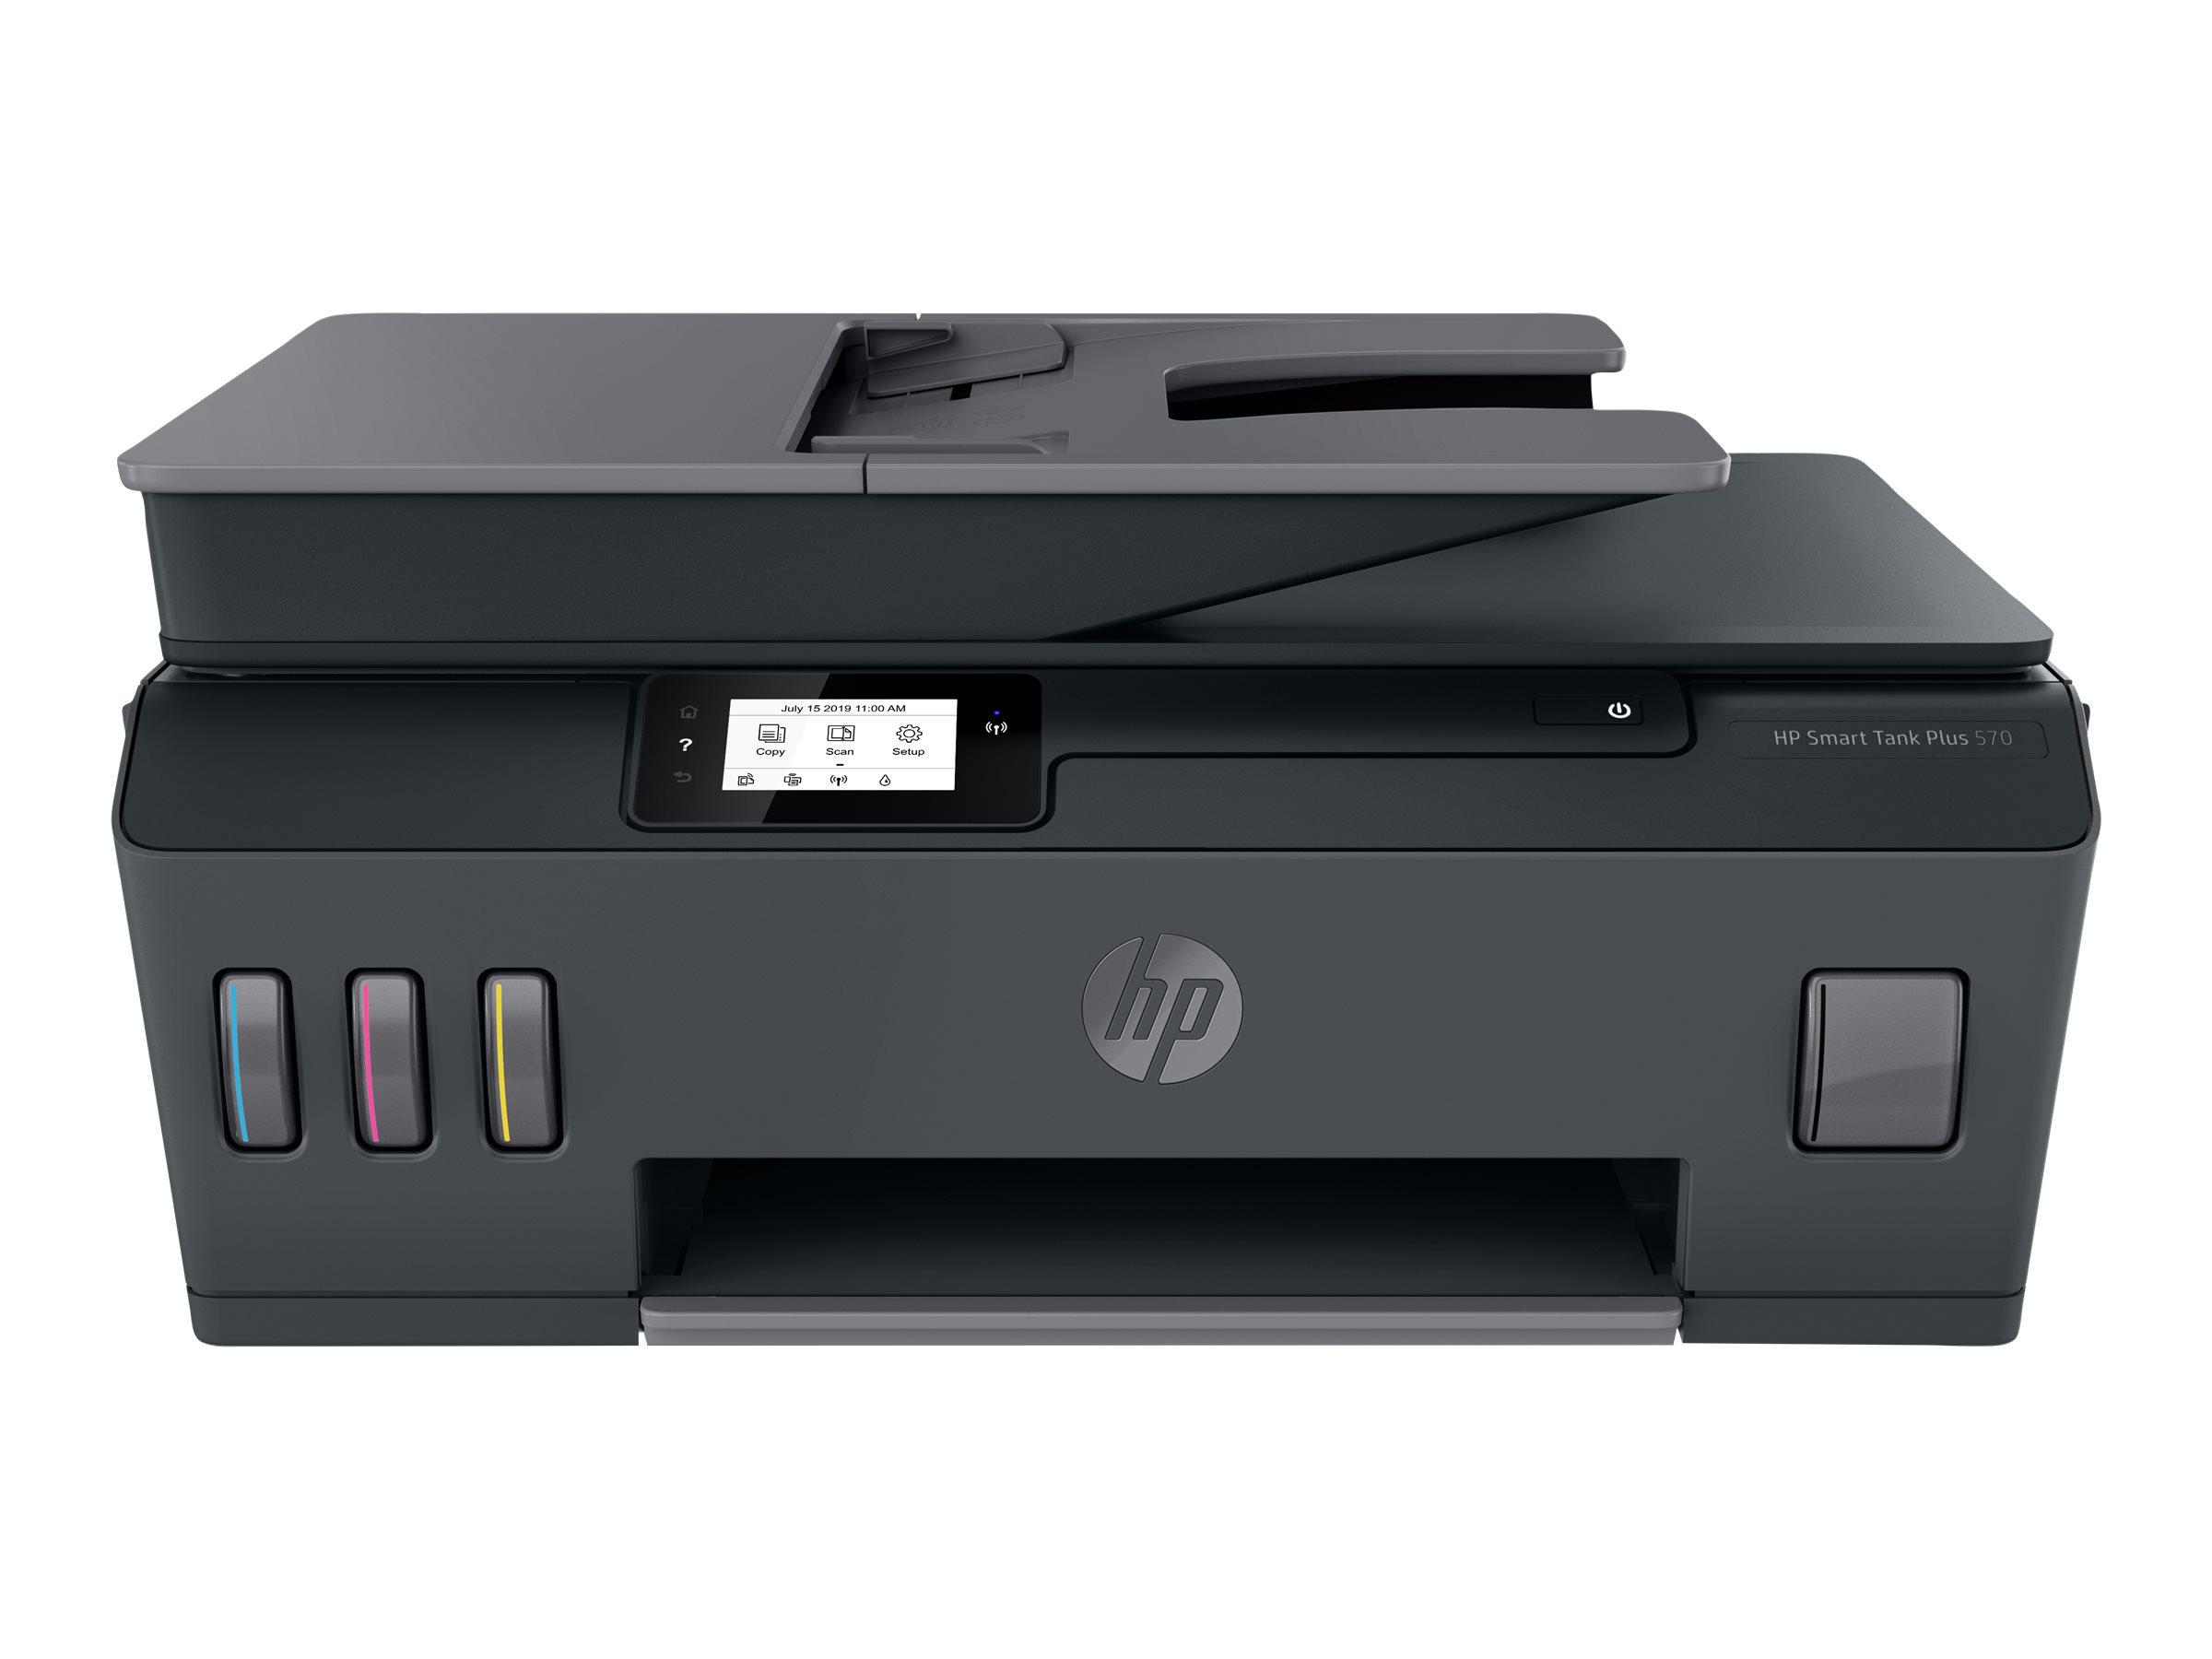 Hp smart tank plus 570 wireless all in one multifunktionsdrucker farbe tintenstrahl legal 216 x 356 mm original a4 legal medien 11997707 5hx14a bhc